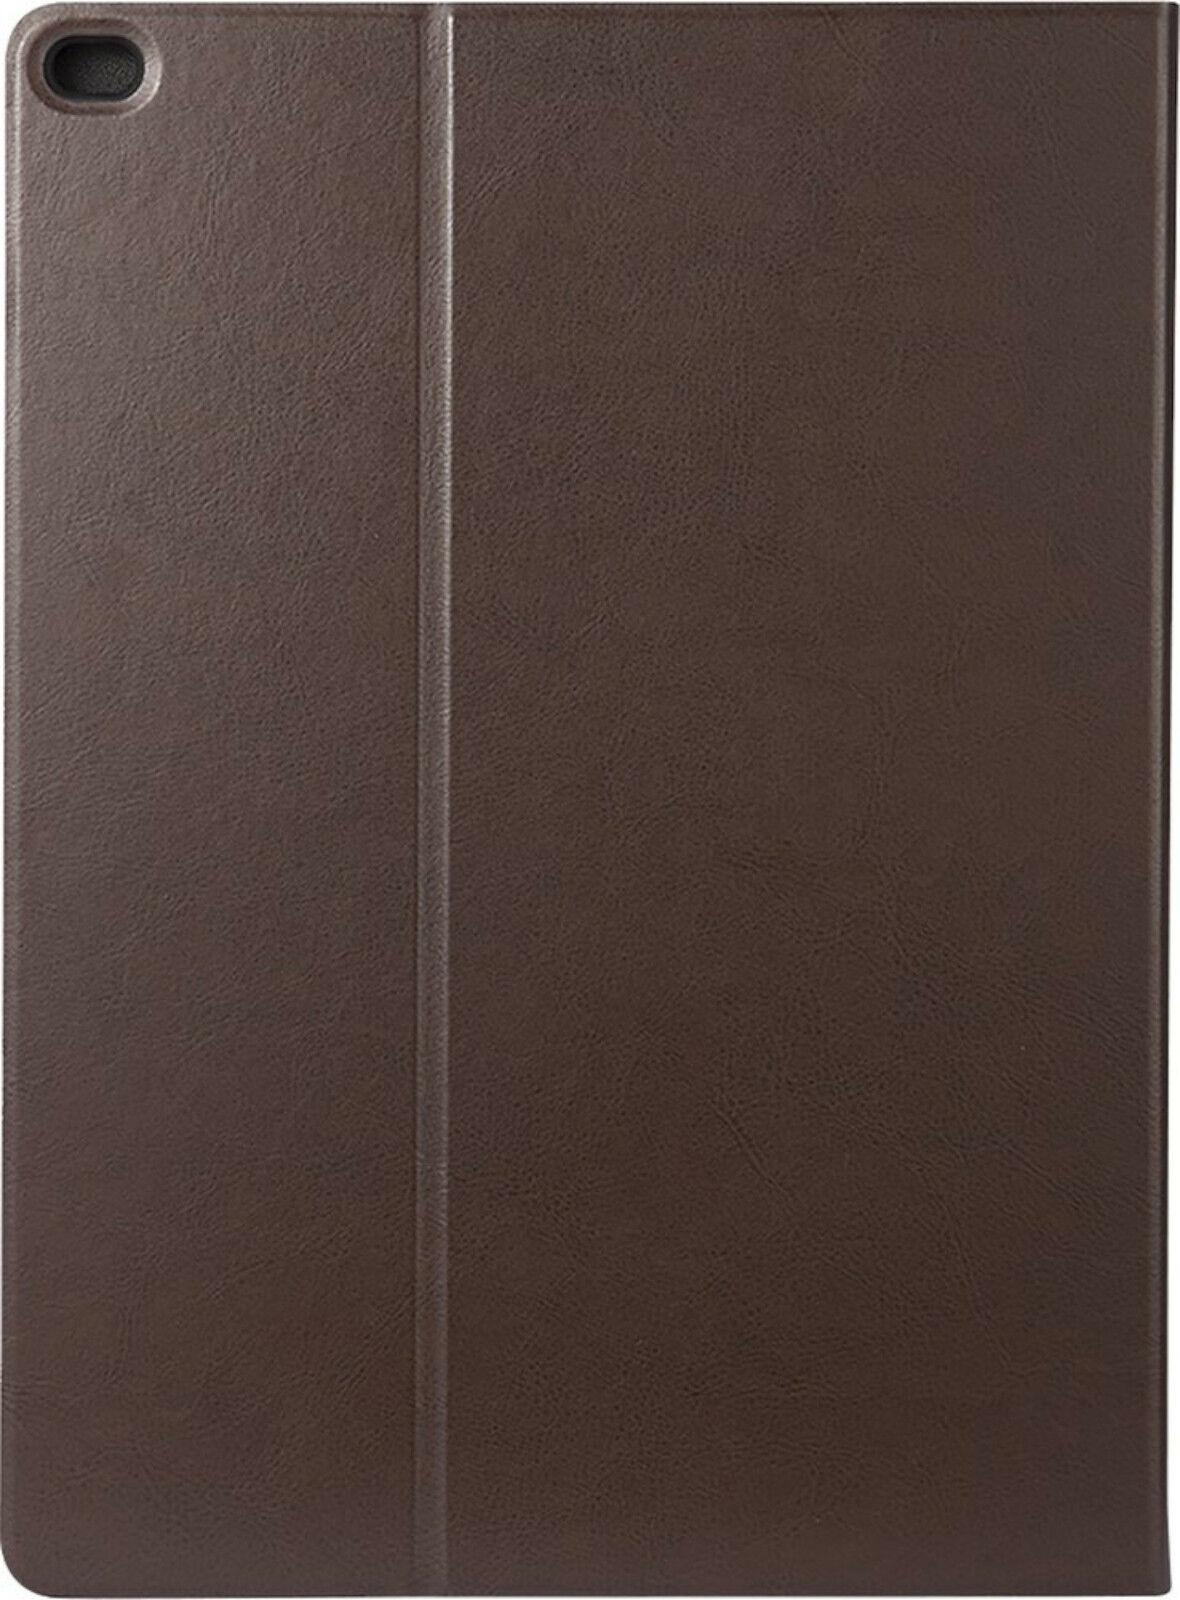 Platinum Folio Case for 1st/2nd Gen 2015/2017 Apple iPad Pro